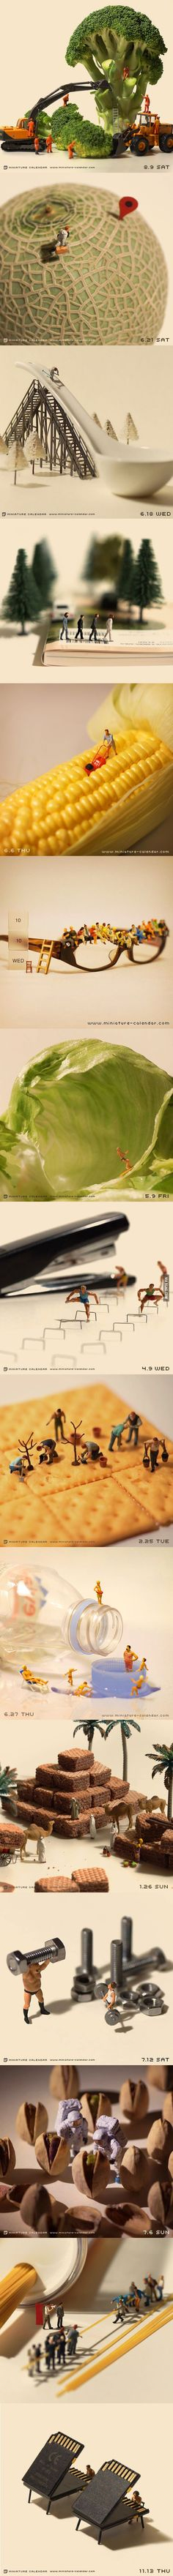 Miniature Calendar by Tanaka Tatsuya - 9GAG